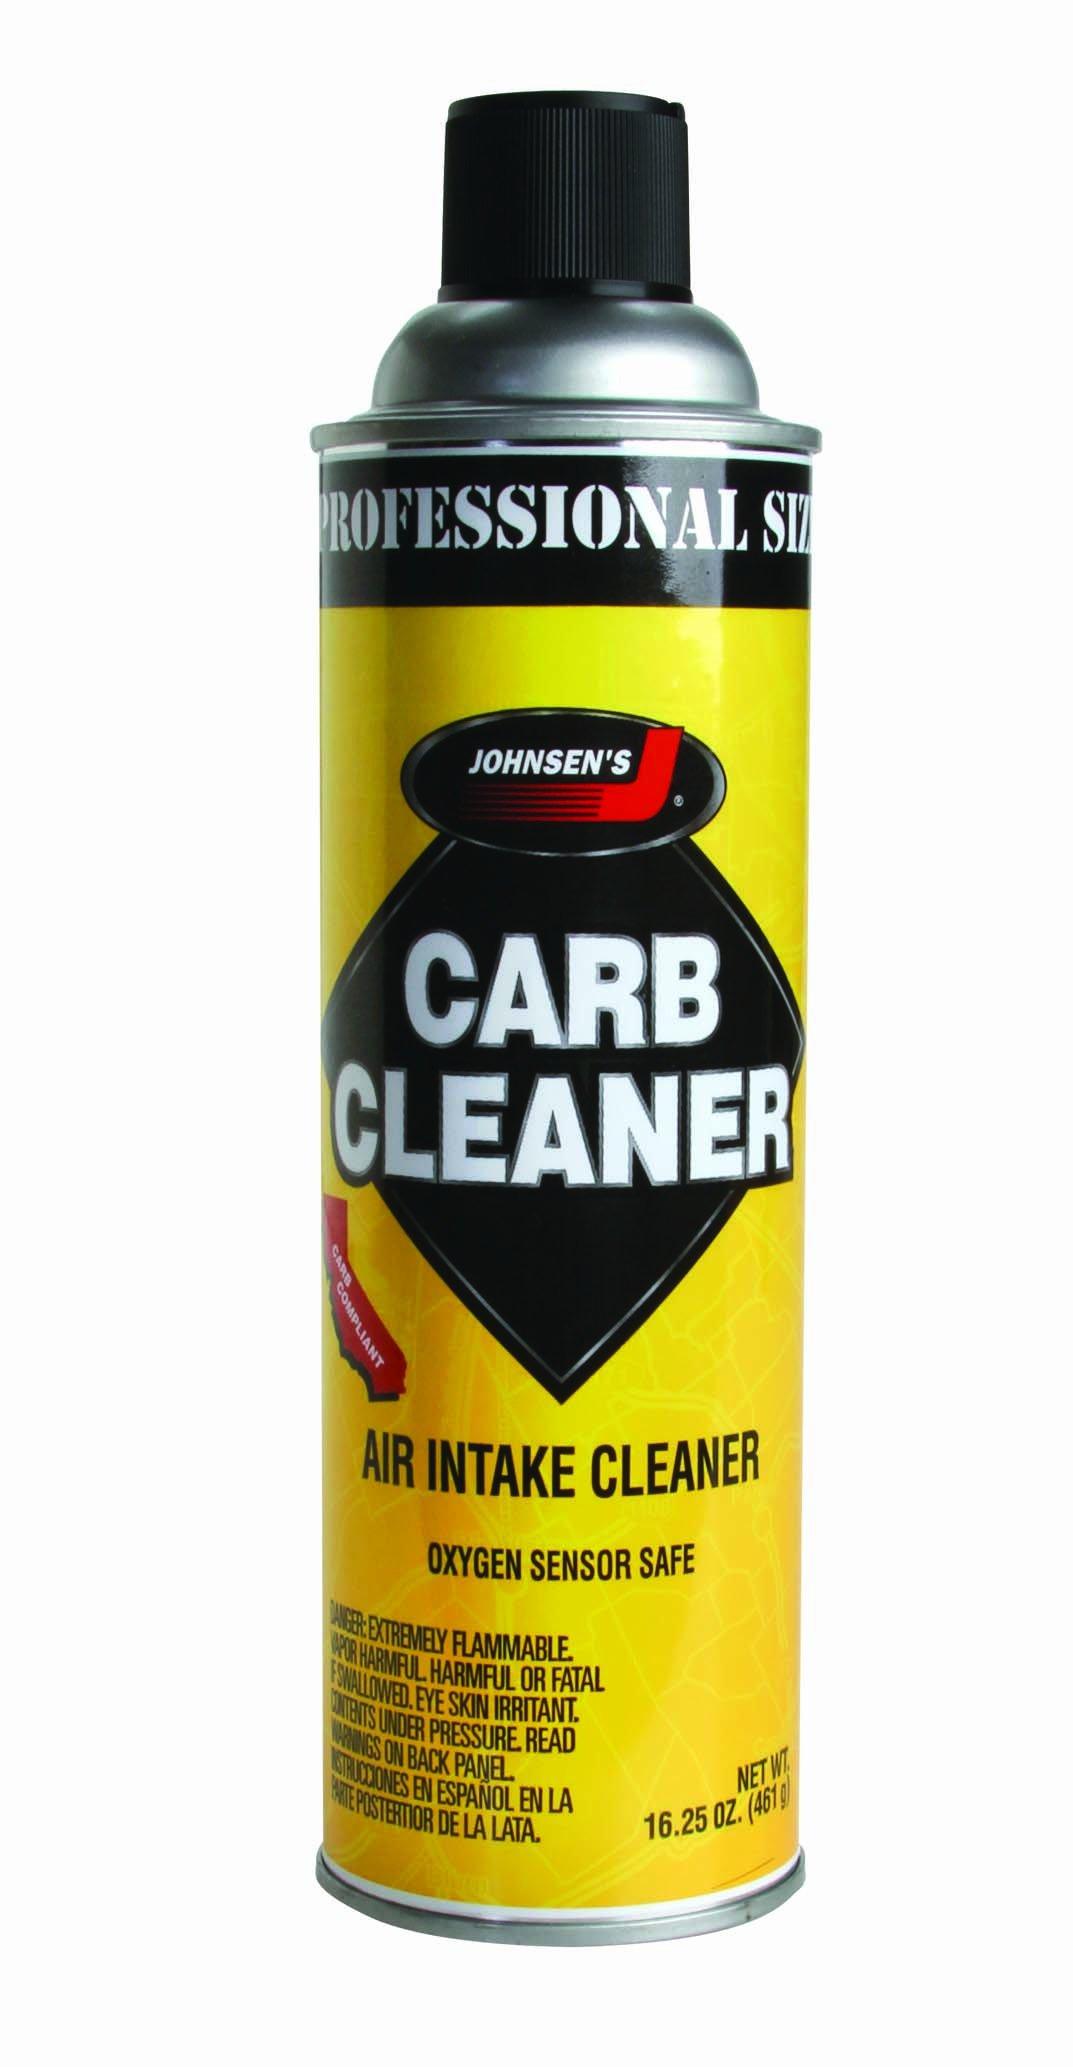 Johnsen's 4642-12PK VOC Compliant Carburetor Cleaner Spray - 16.25 oz., (Pack of 12) by Johnsen's (Image #1)